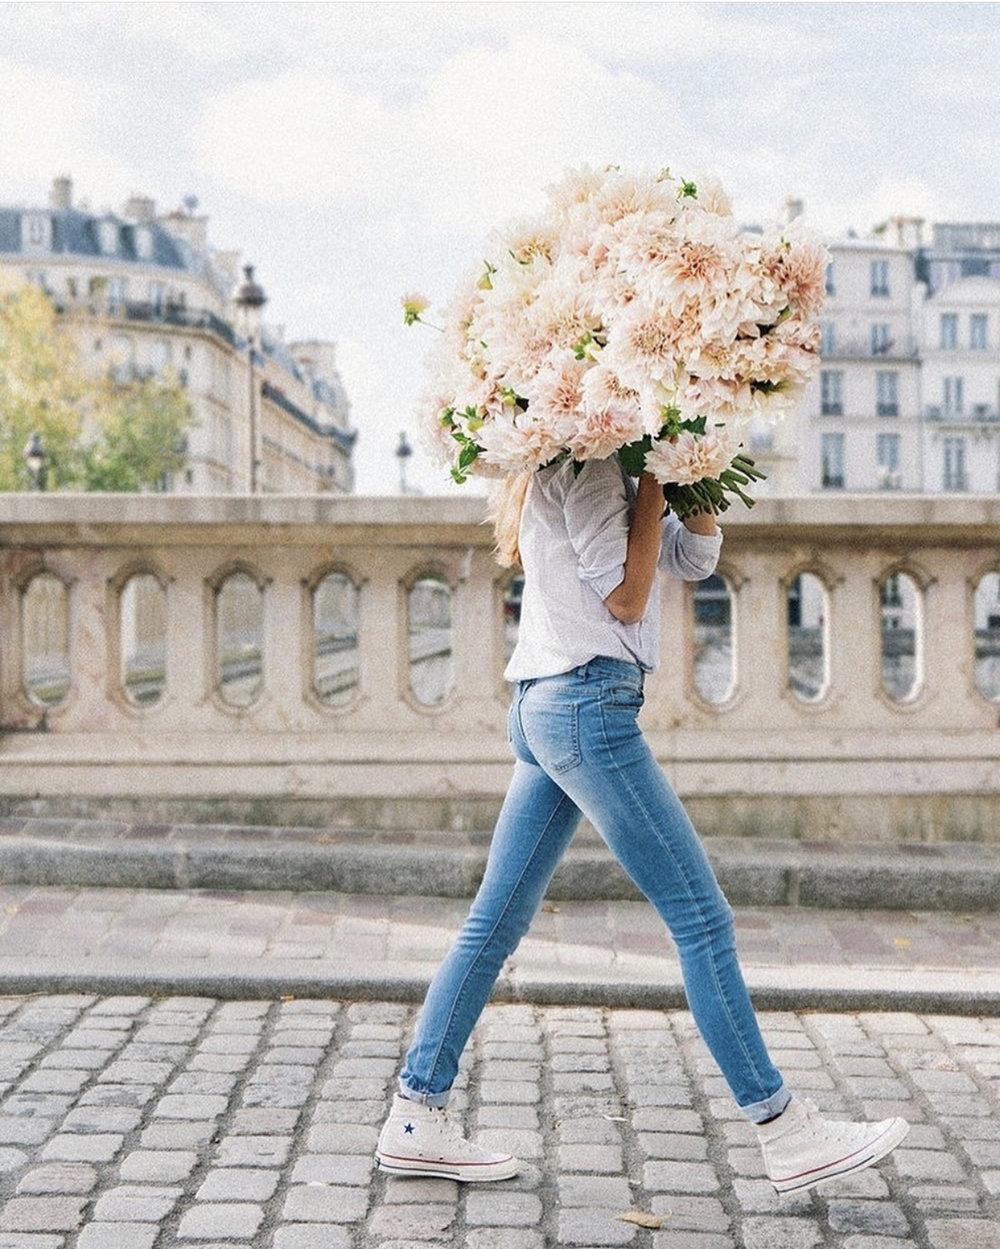 flower-bouquet-europe-ashley-jones-com